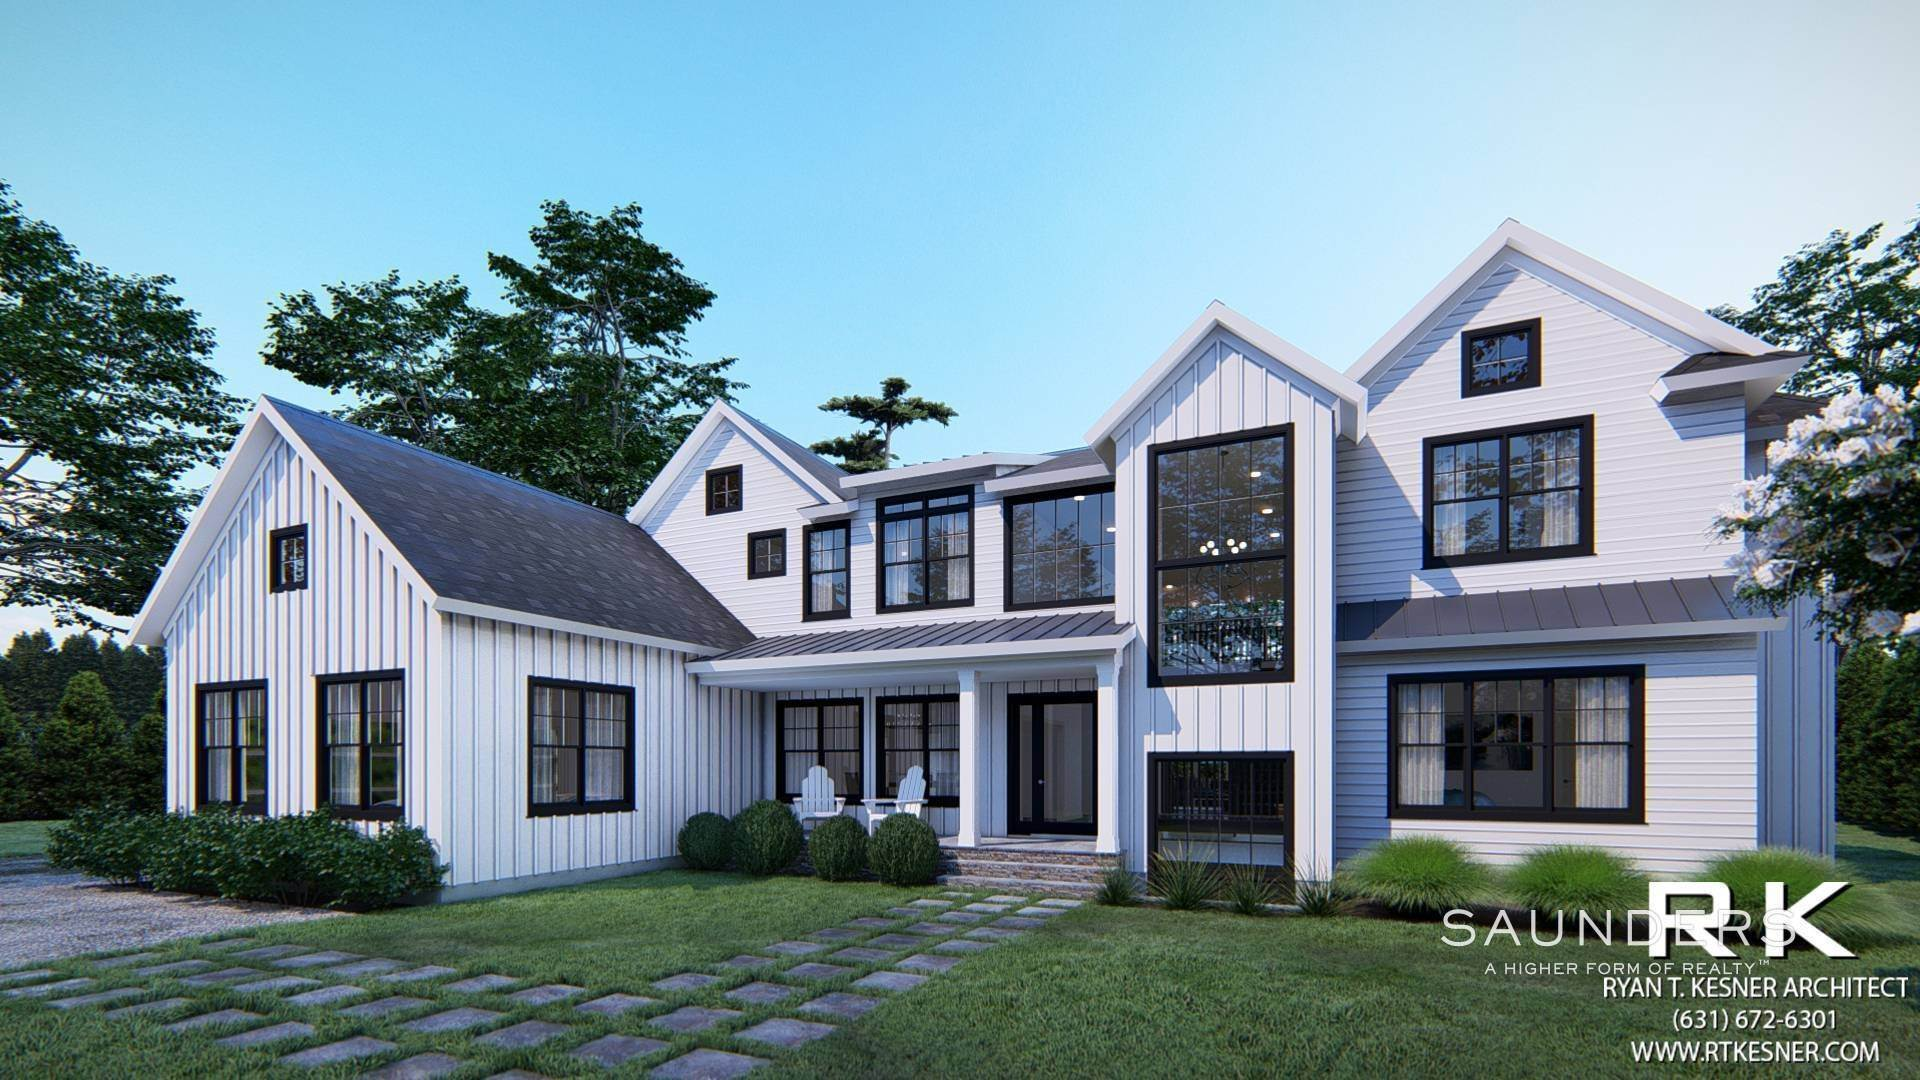 4. Land for Sale at Rare Prime Building Lot In Bridgehampton Bordering Reserve 30 Fair Hills Lane, Bridgehampton, Southampton Town, NY 11932